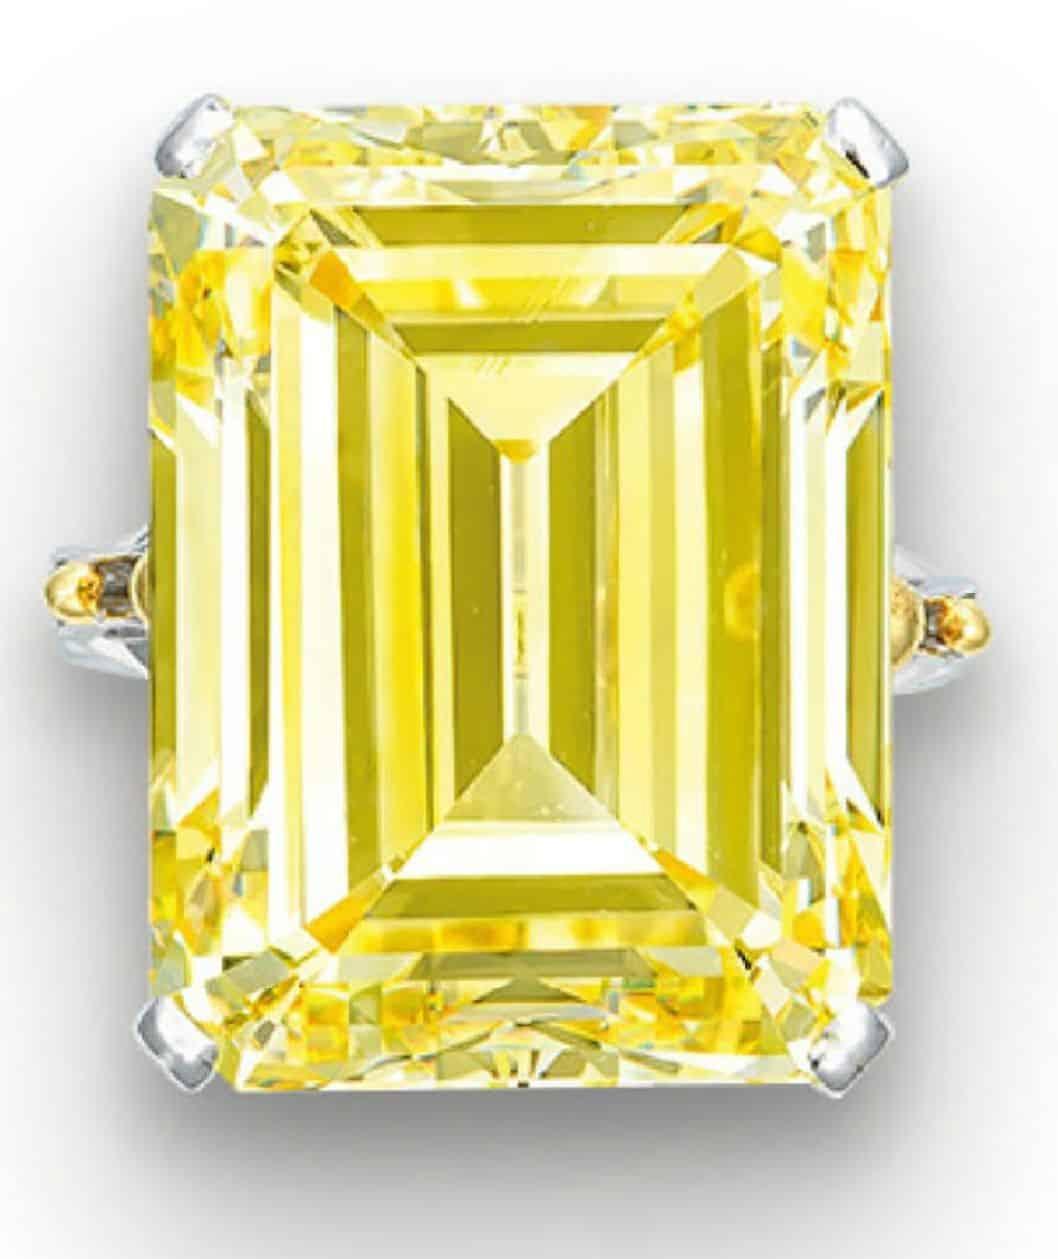 LOT 2031 - AN IMPRESSIVE COLOURED DIAMOND RING